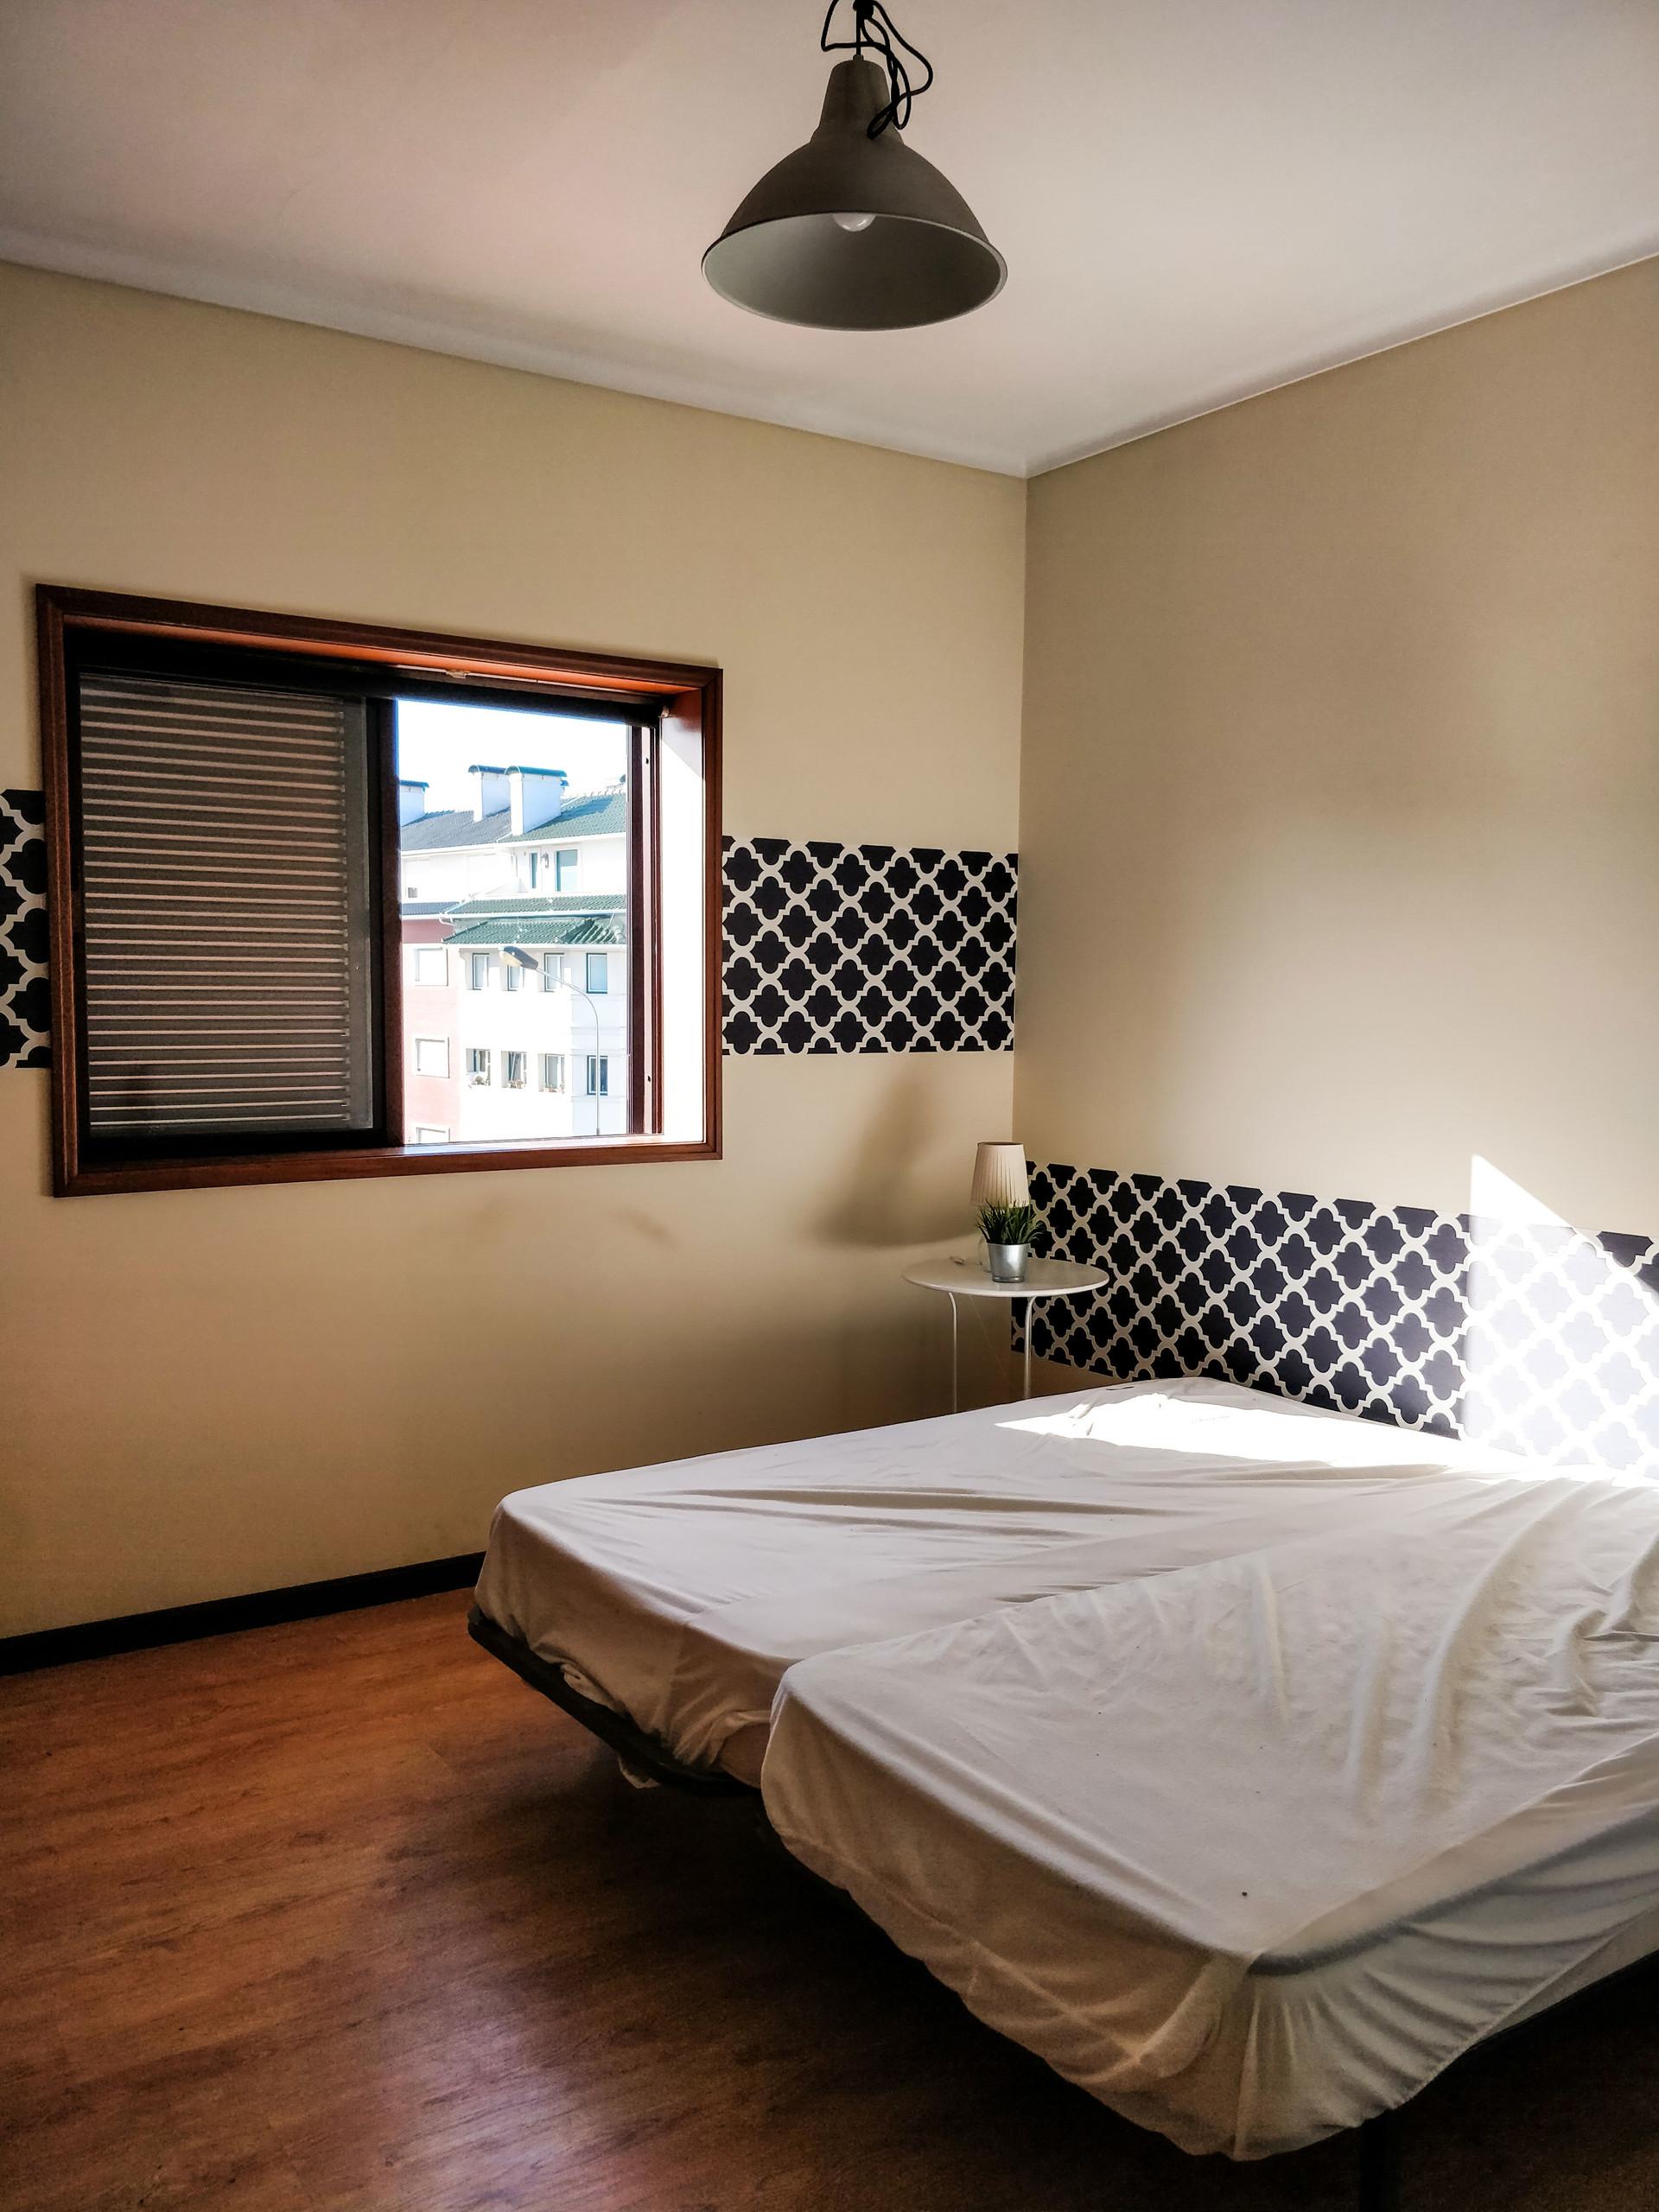 two-rooms-university-aveiro-33679af99e8f680d59f1f0870d0030c3